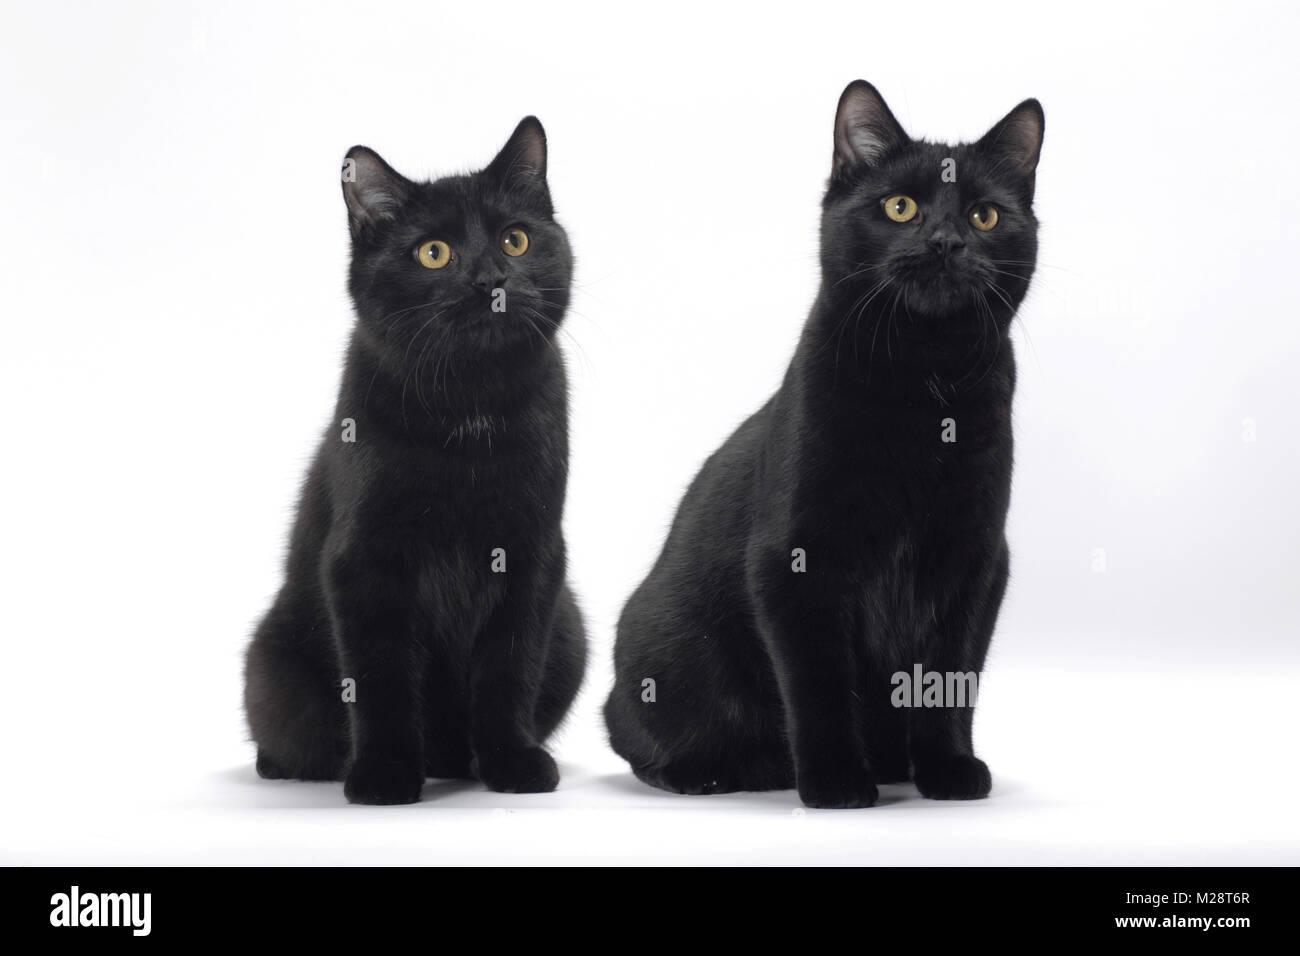 Manx Cats Stock Photos & Manx Cats Stock Images - Alamy